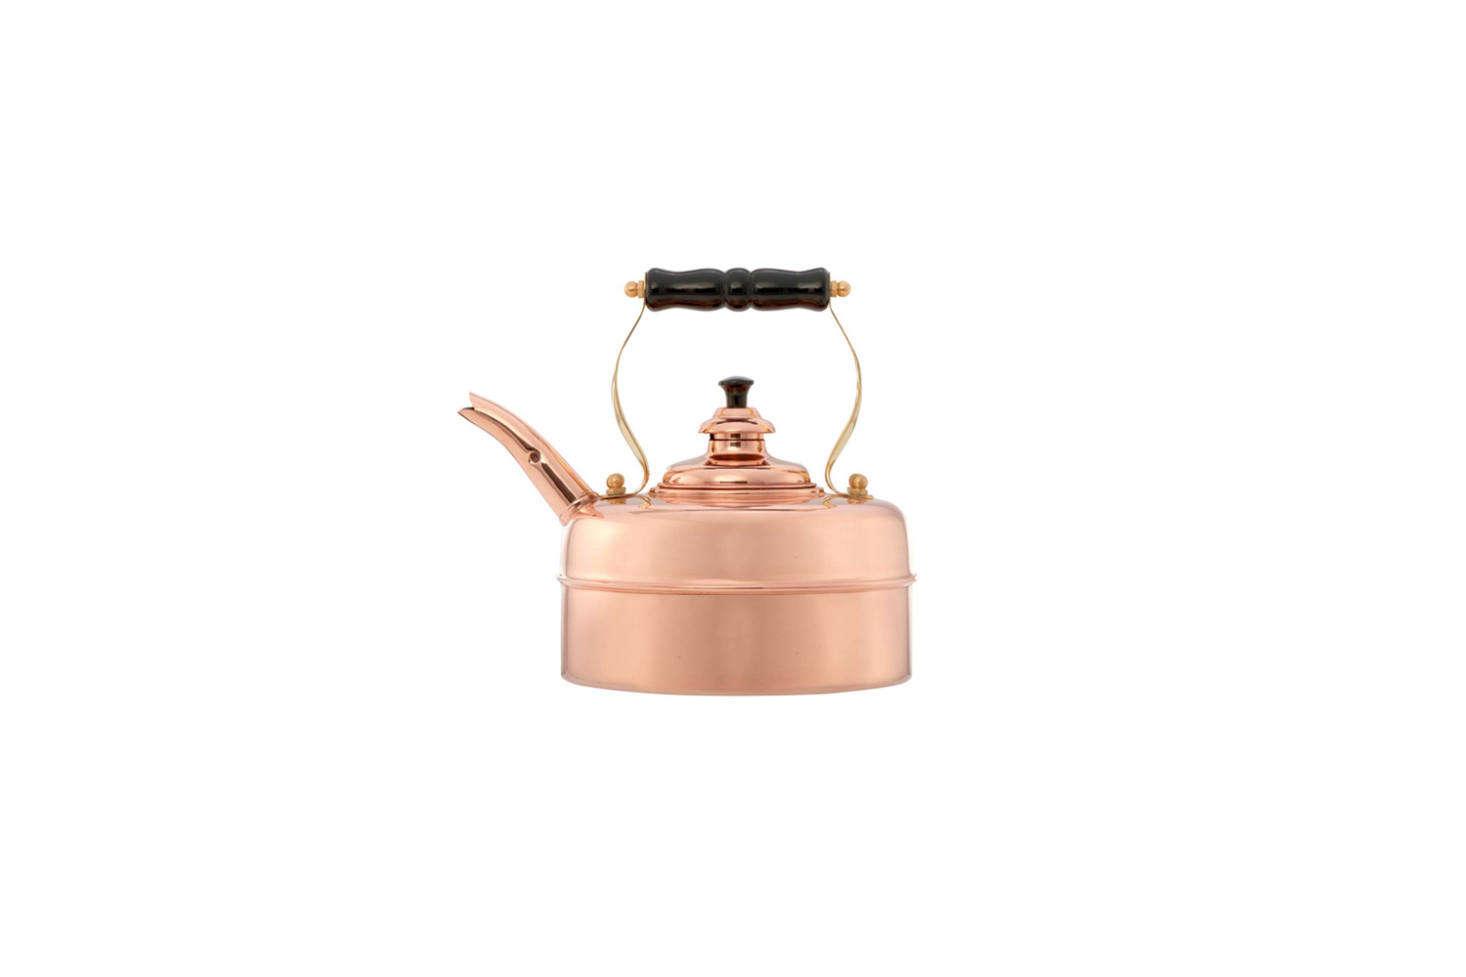 The Simplex Kensington Tea Kettle in Copper is $3.96 at Williams-Sonoma.